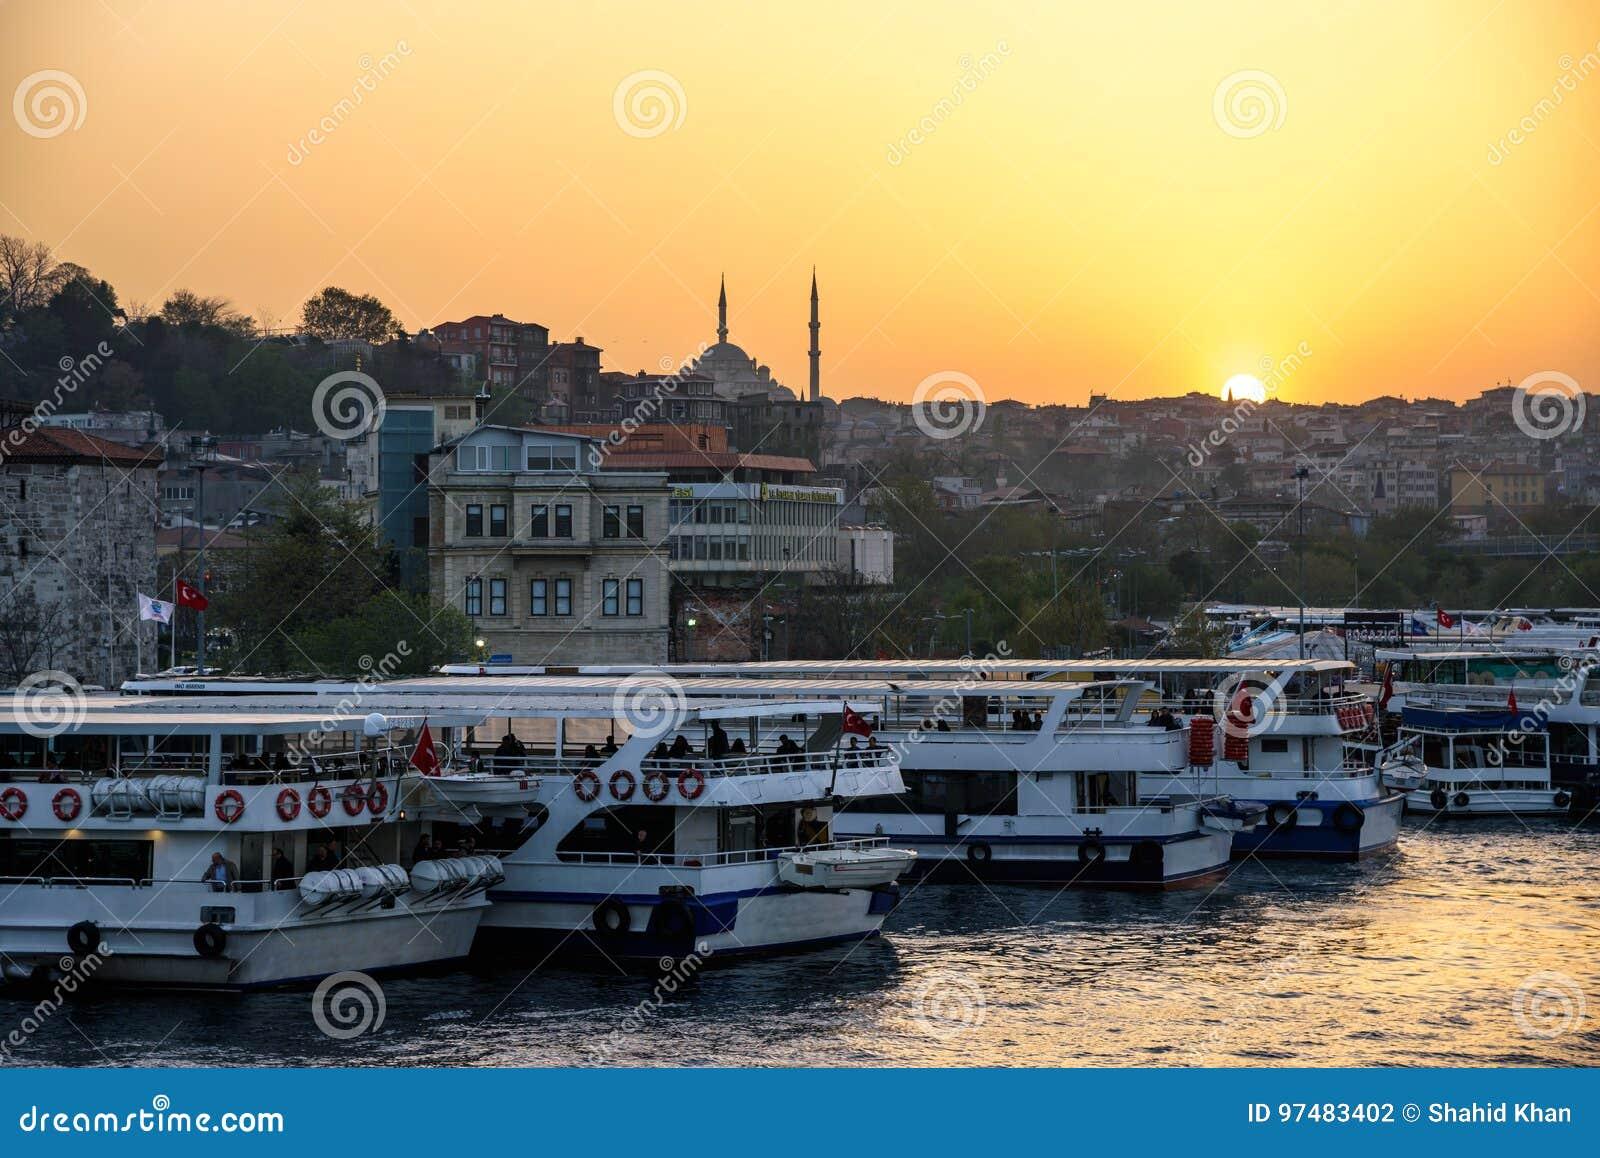 Bosphorus Costantinopoli Turchia